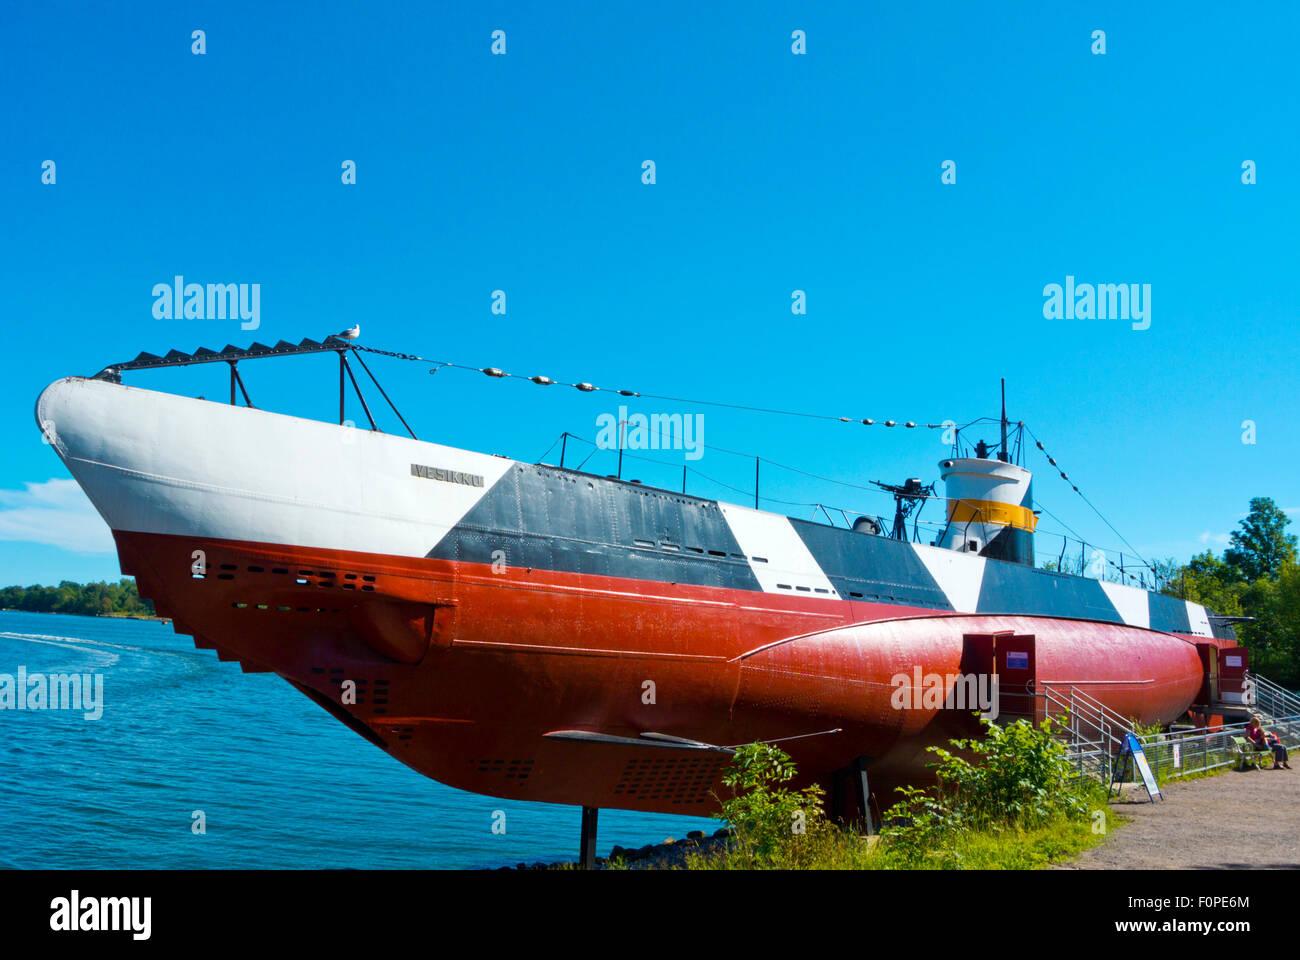 Vesikko, submarine, part of the Maritime museum, Suomenlinna, Sveaborg, fortress island, Helsinki, Finland - Stock Image